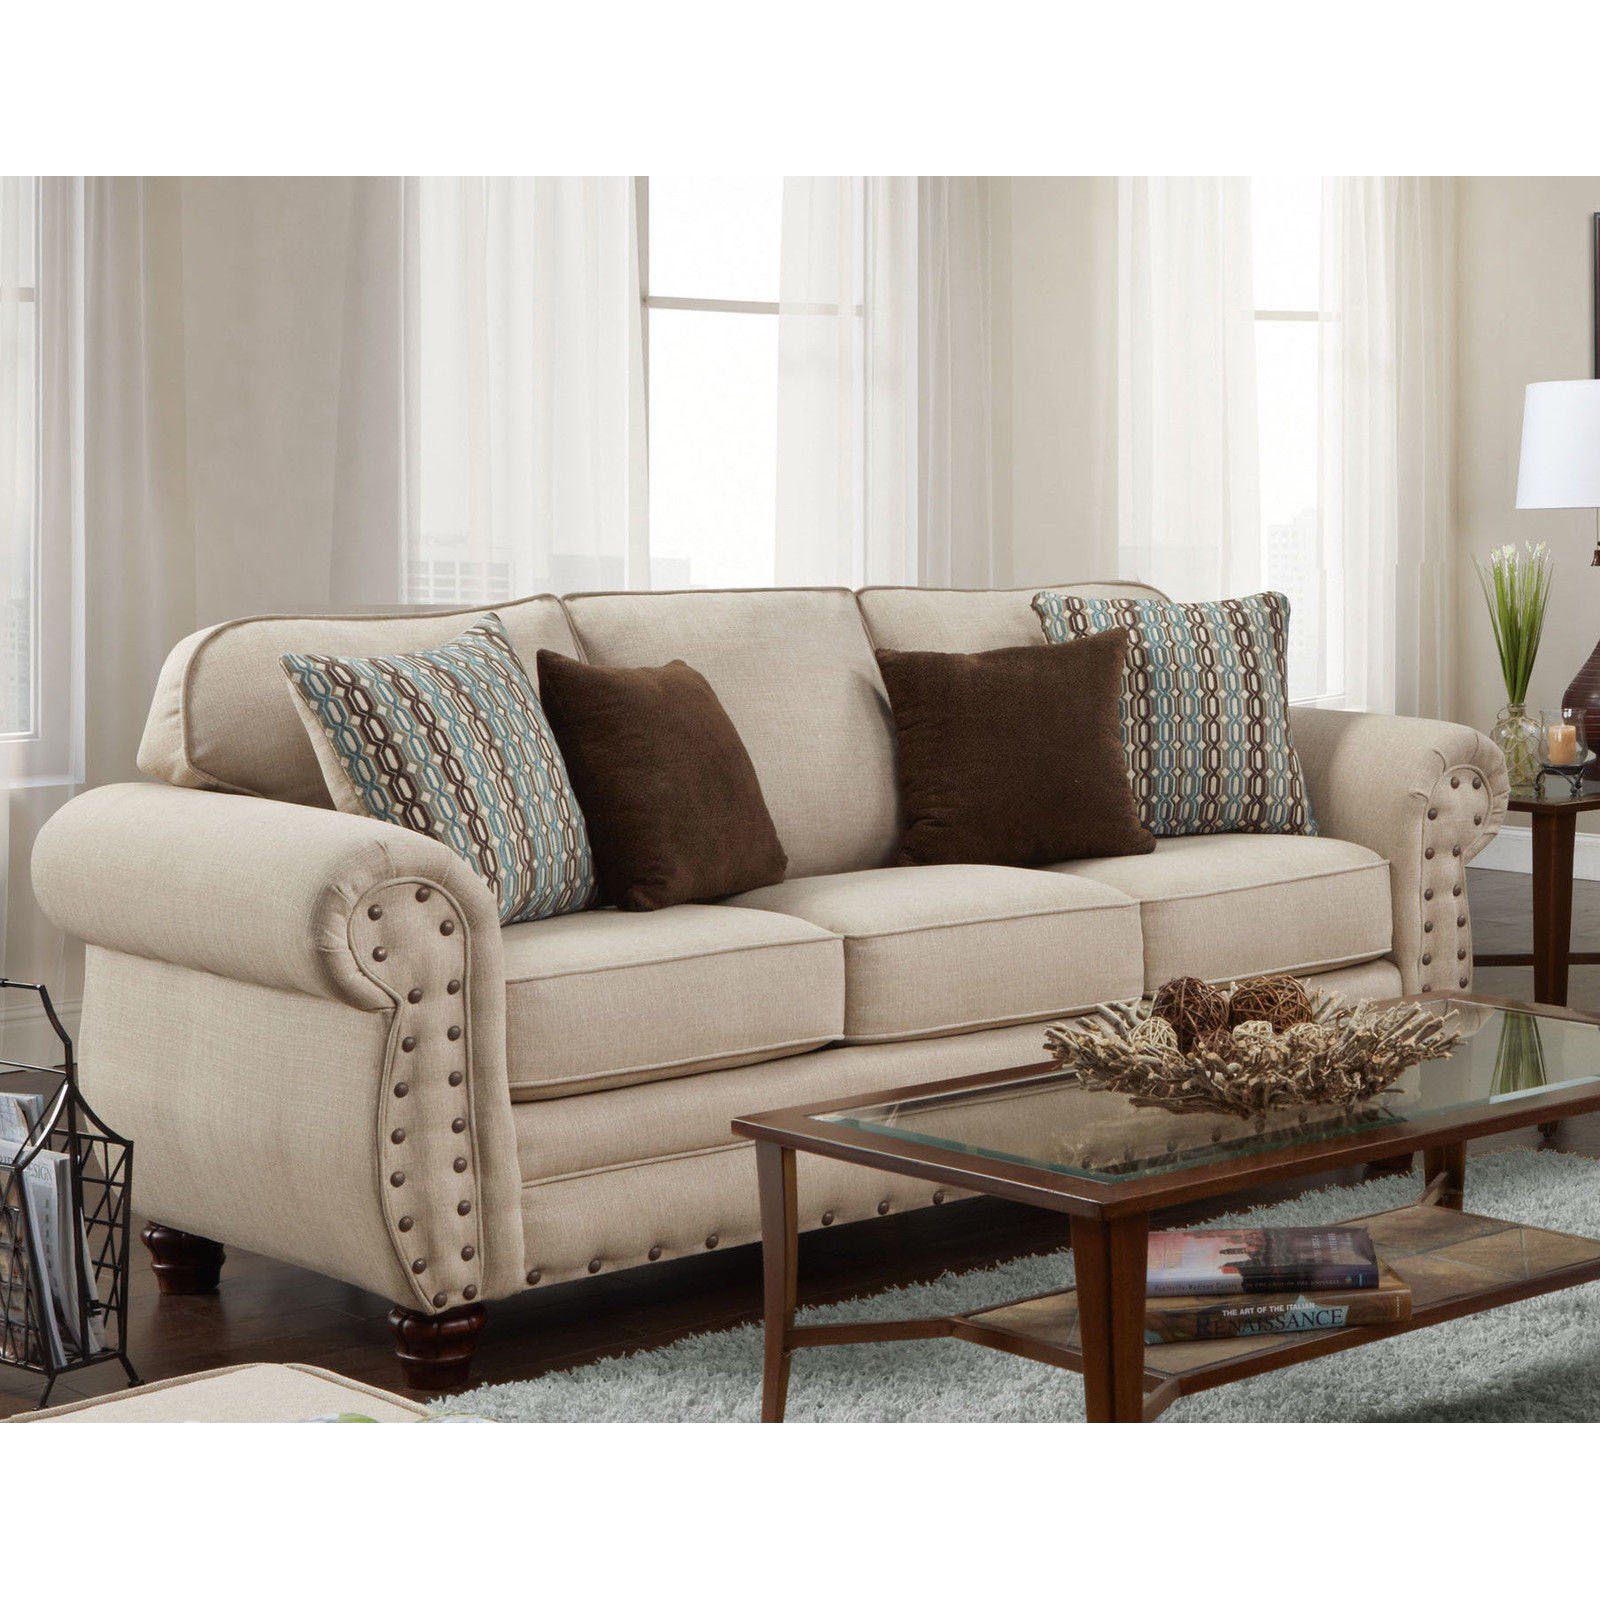 American Furniture Classics Abington Sand Sofa Living Room Sets